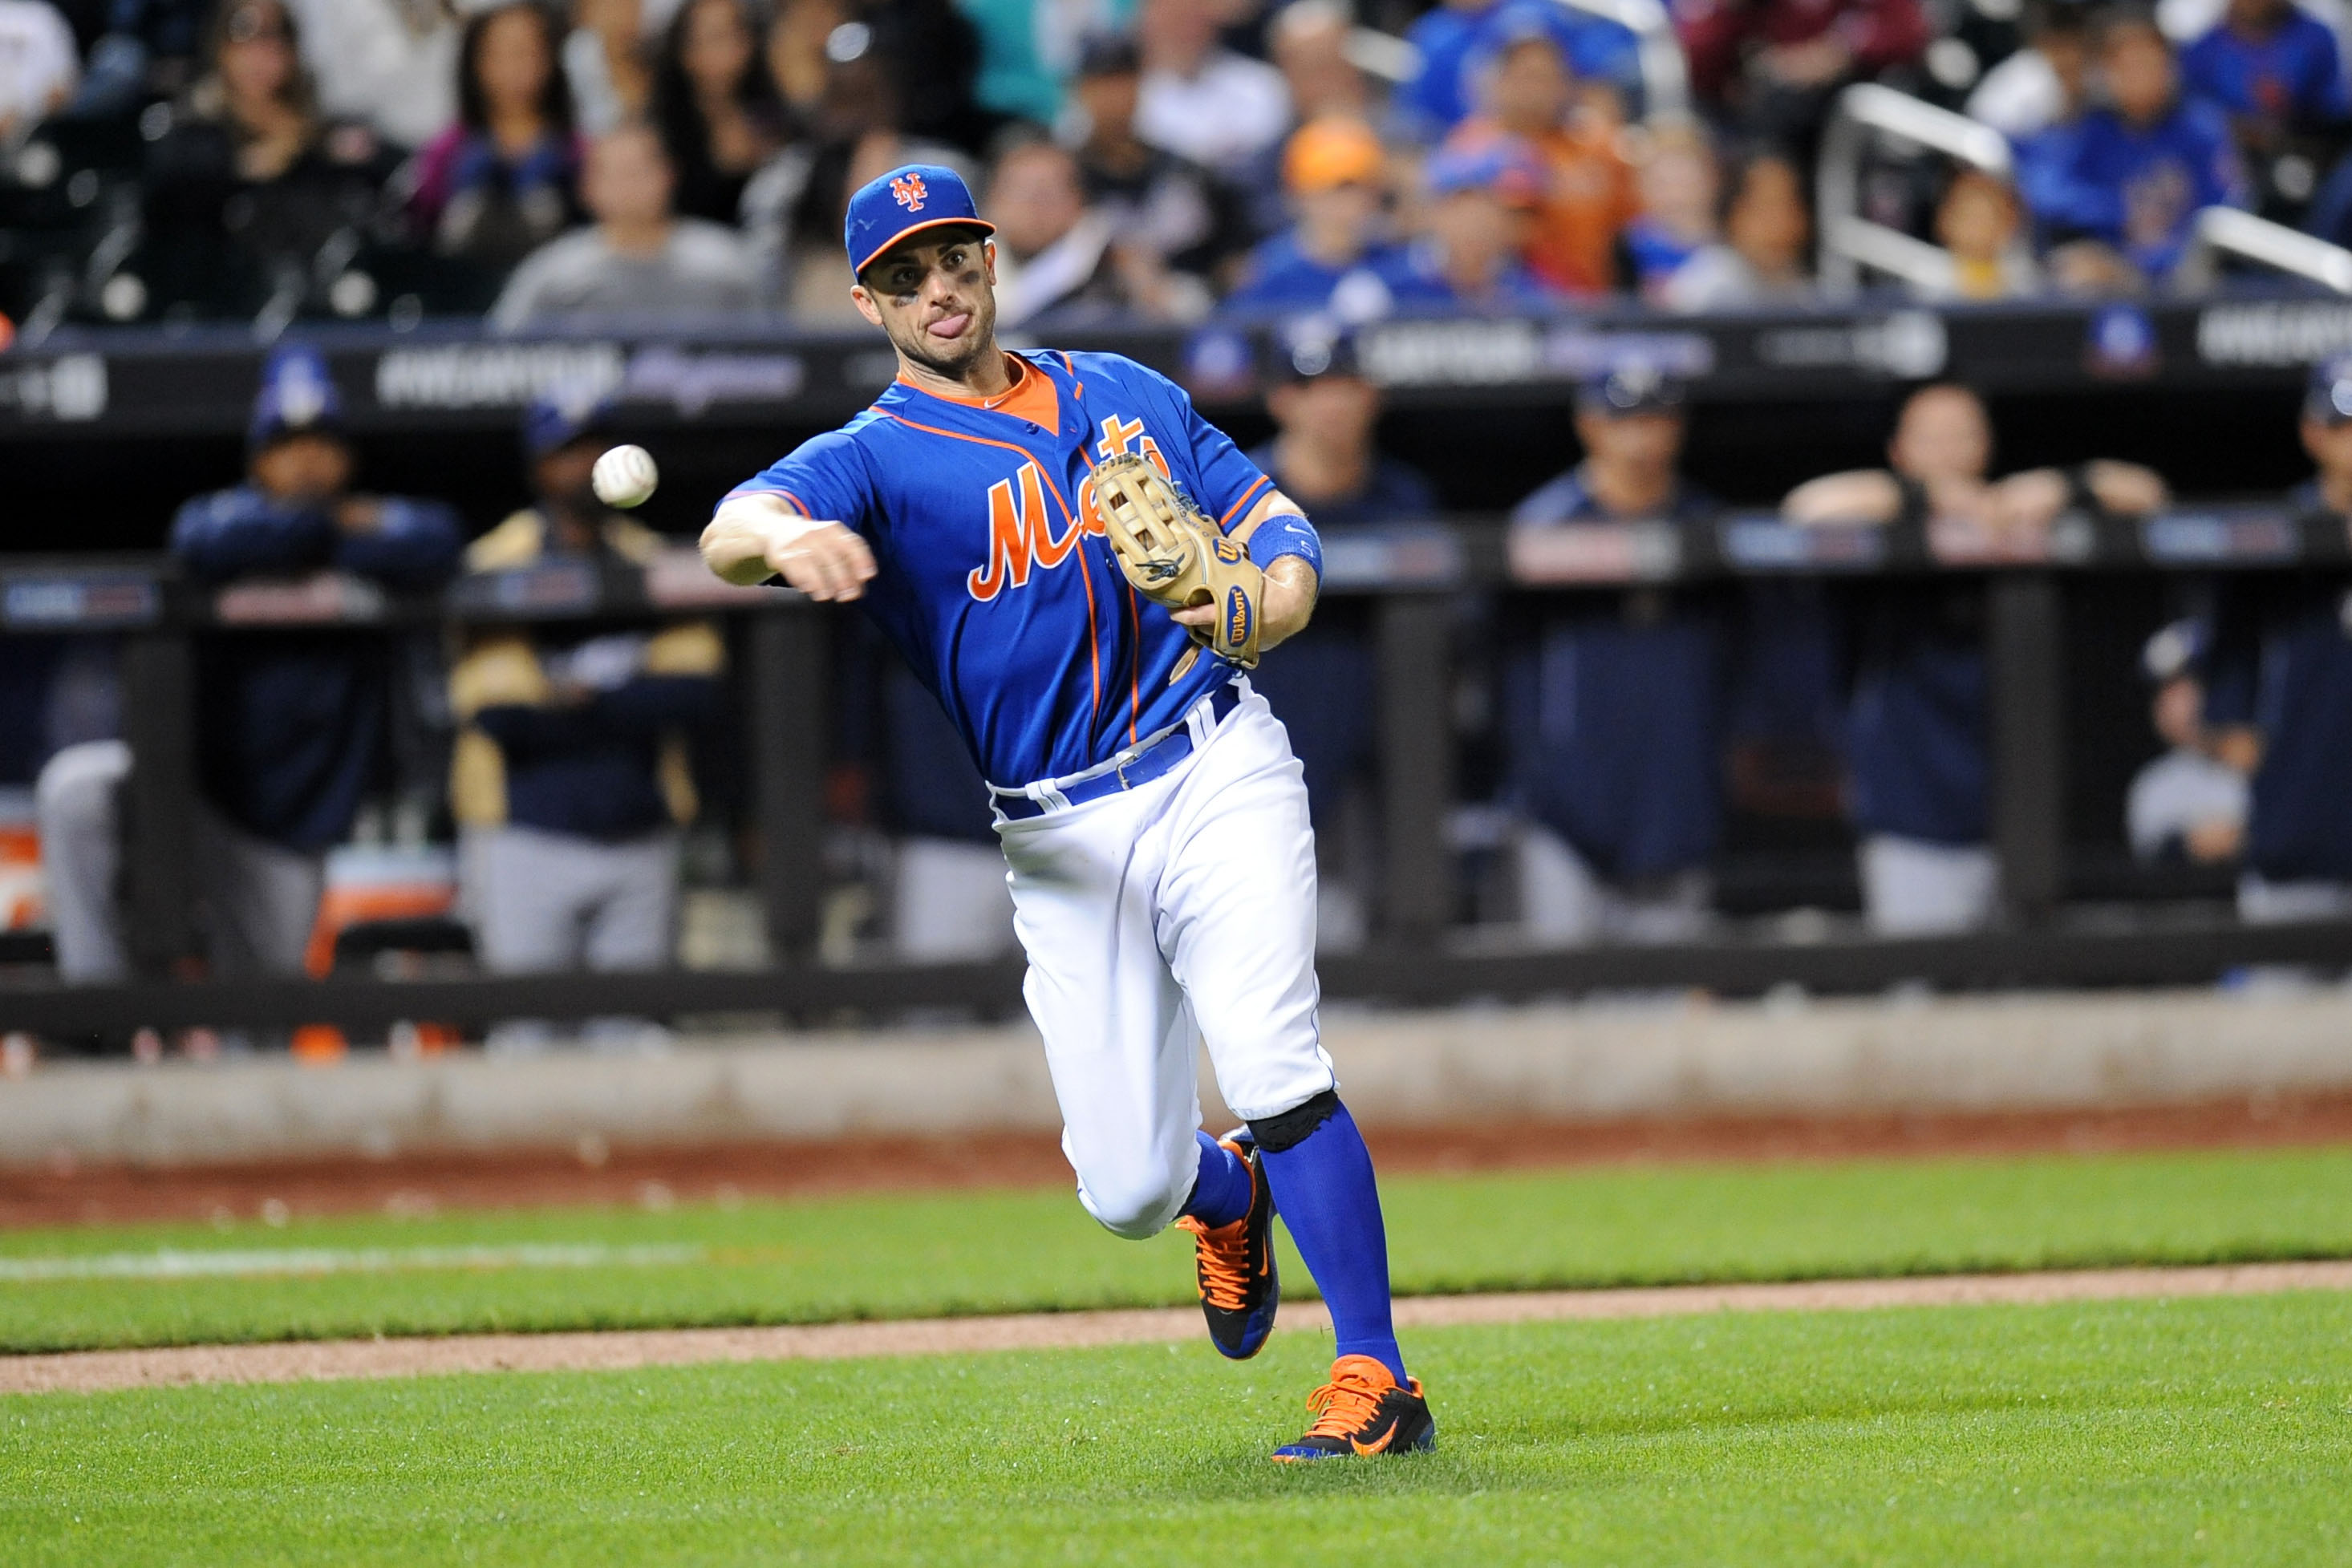 NEW YORK METS baseball mlb 72 wallpaper 2932x1955 232382 2932x1955